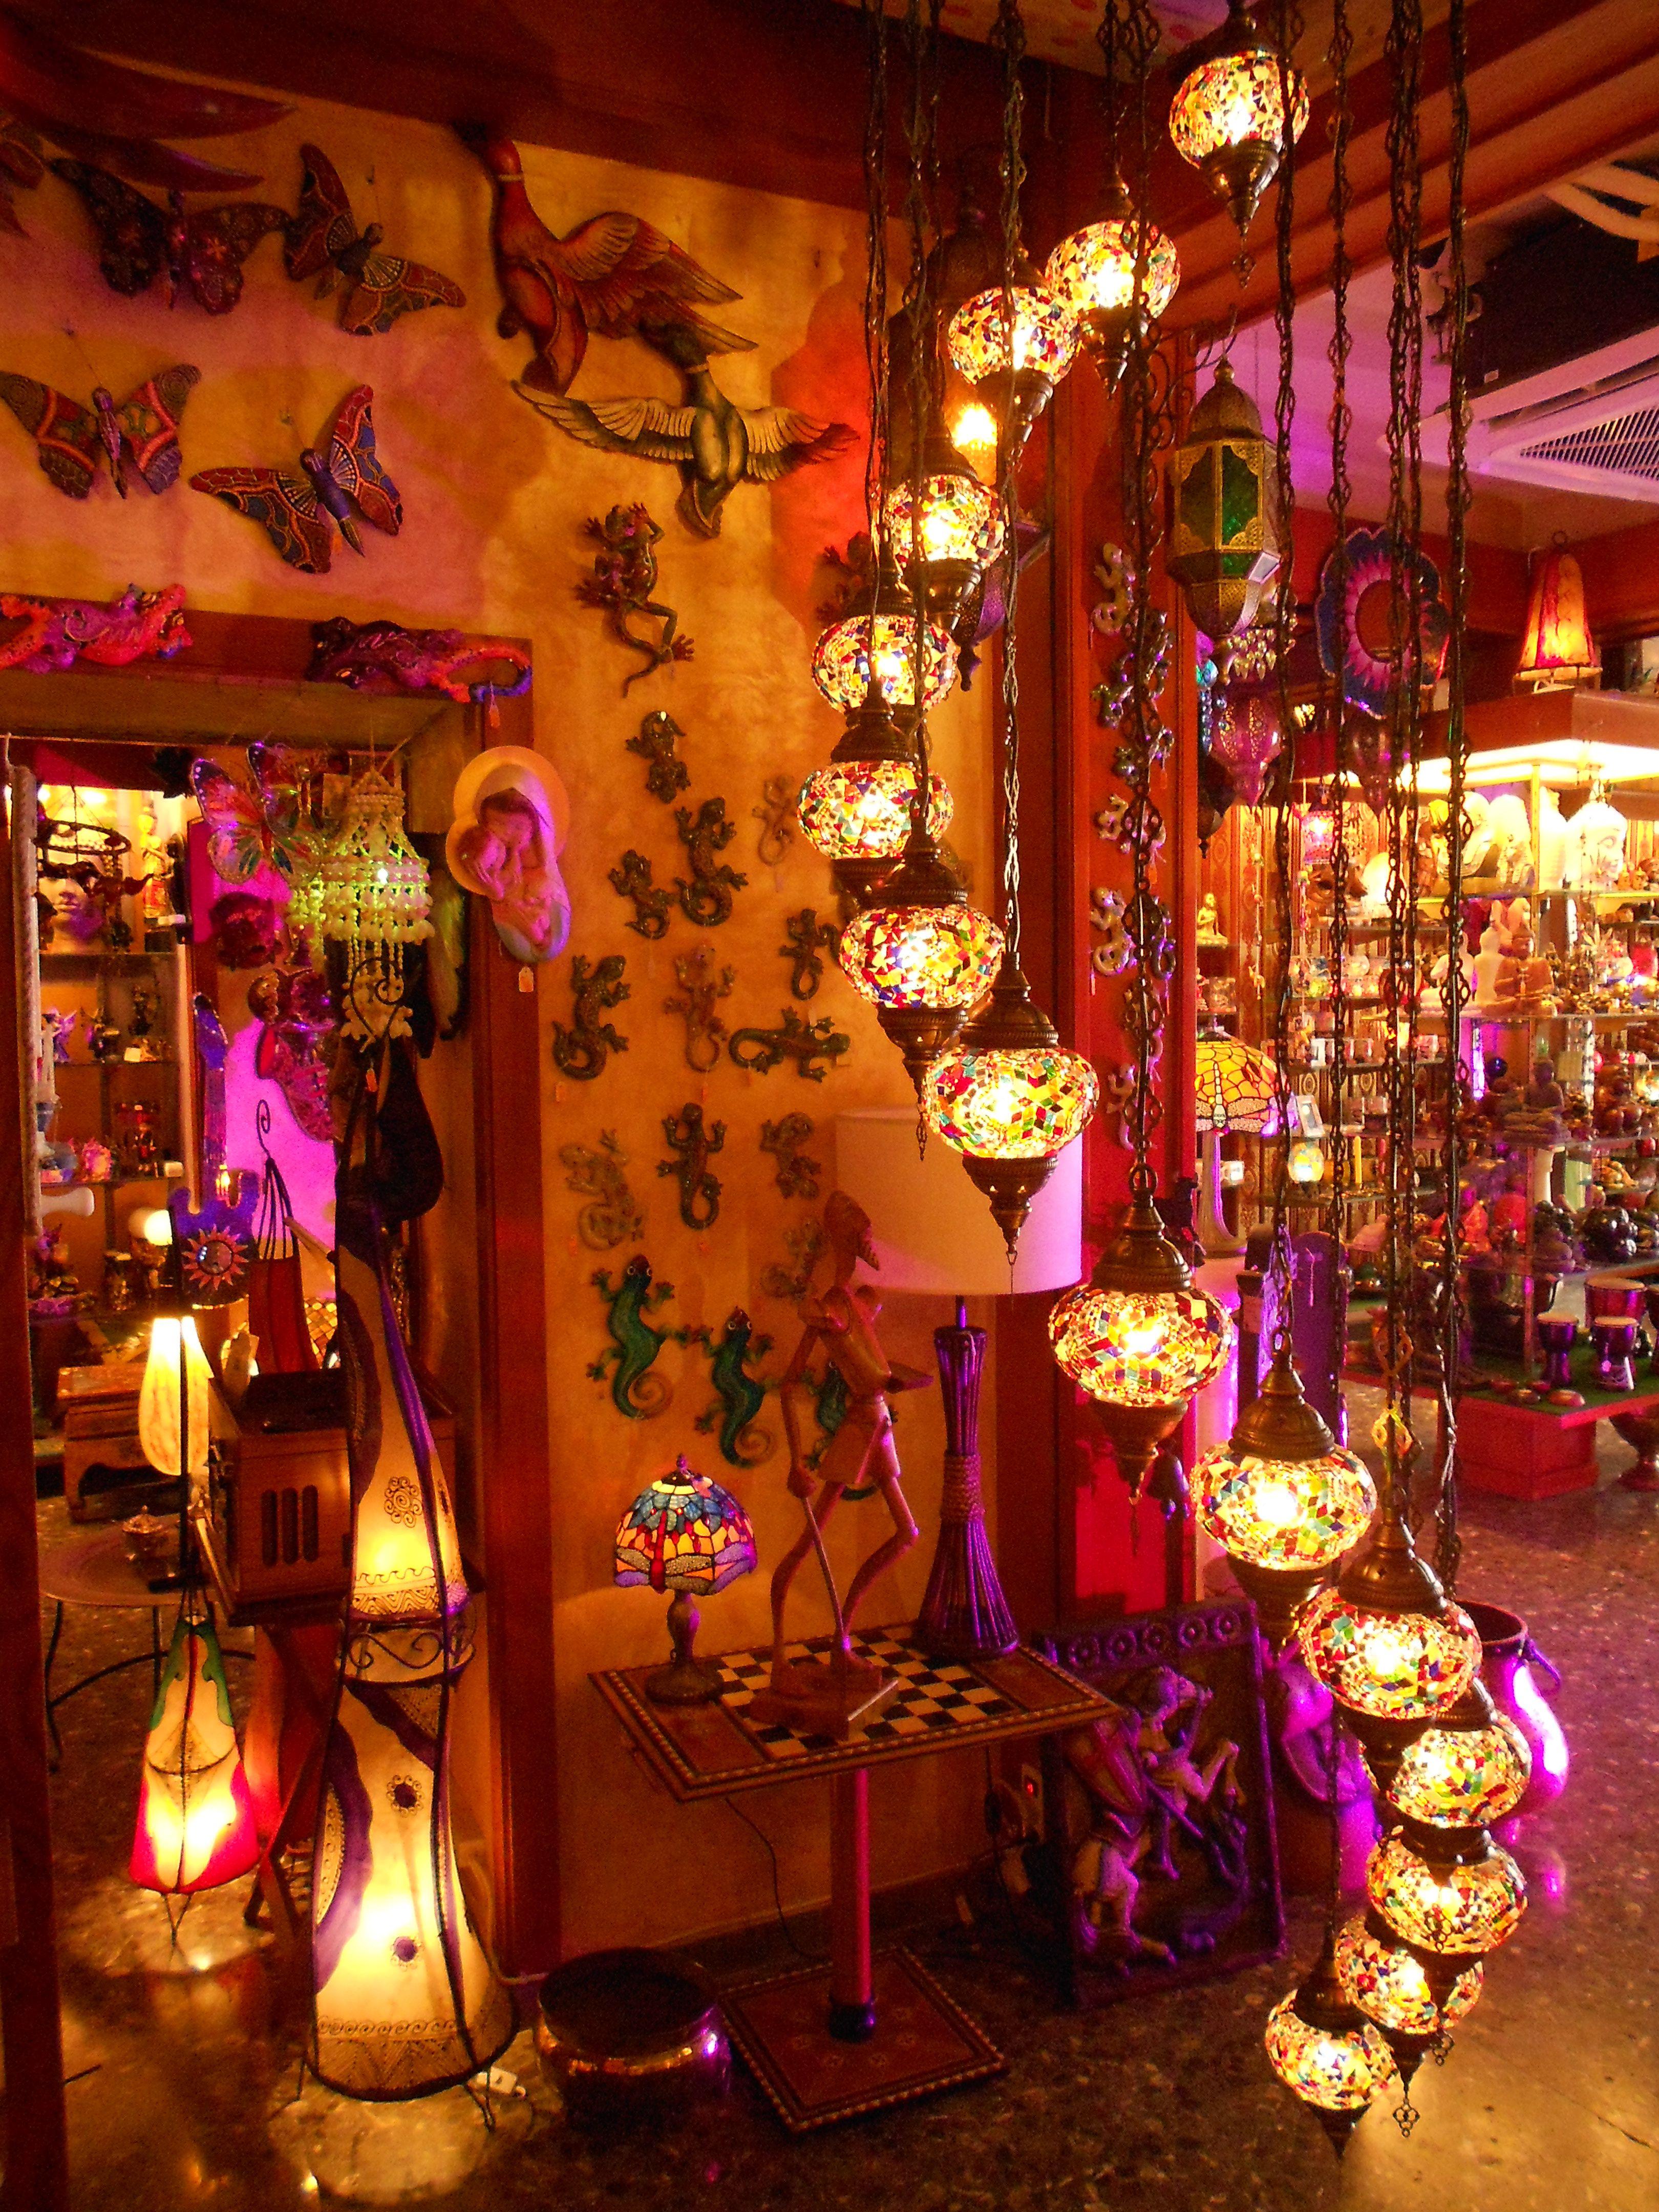 Lamparas turcas | Lamparas turcas El Museu | Pinterest | Lámparas ...